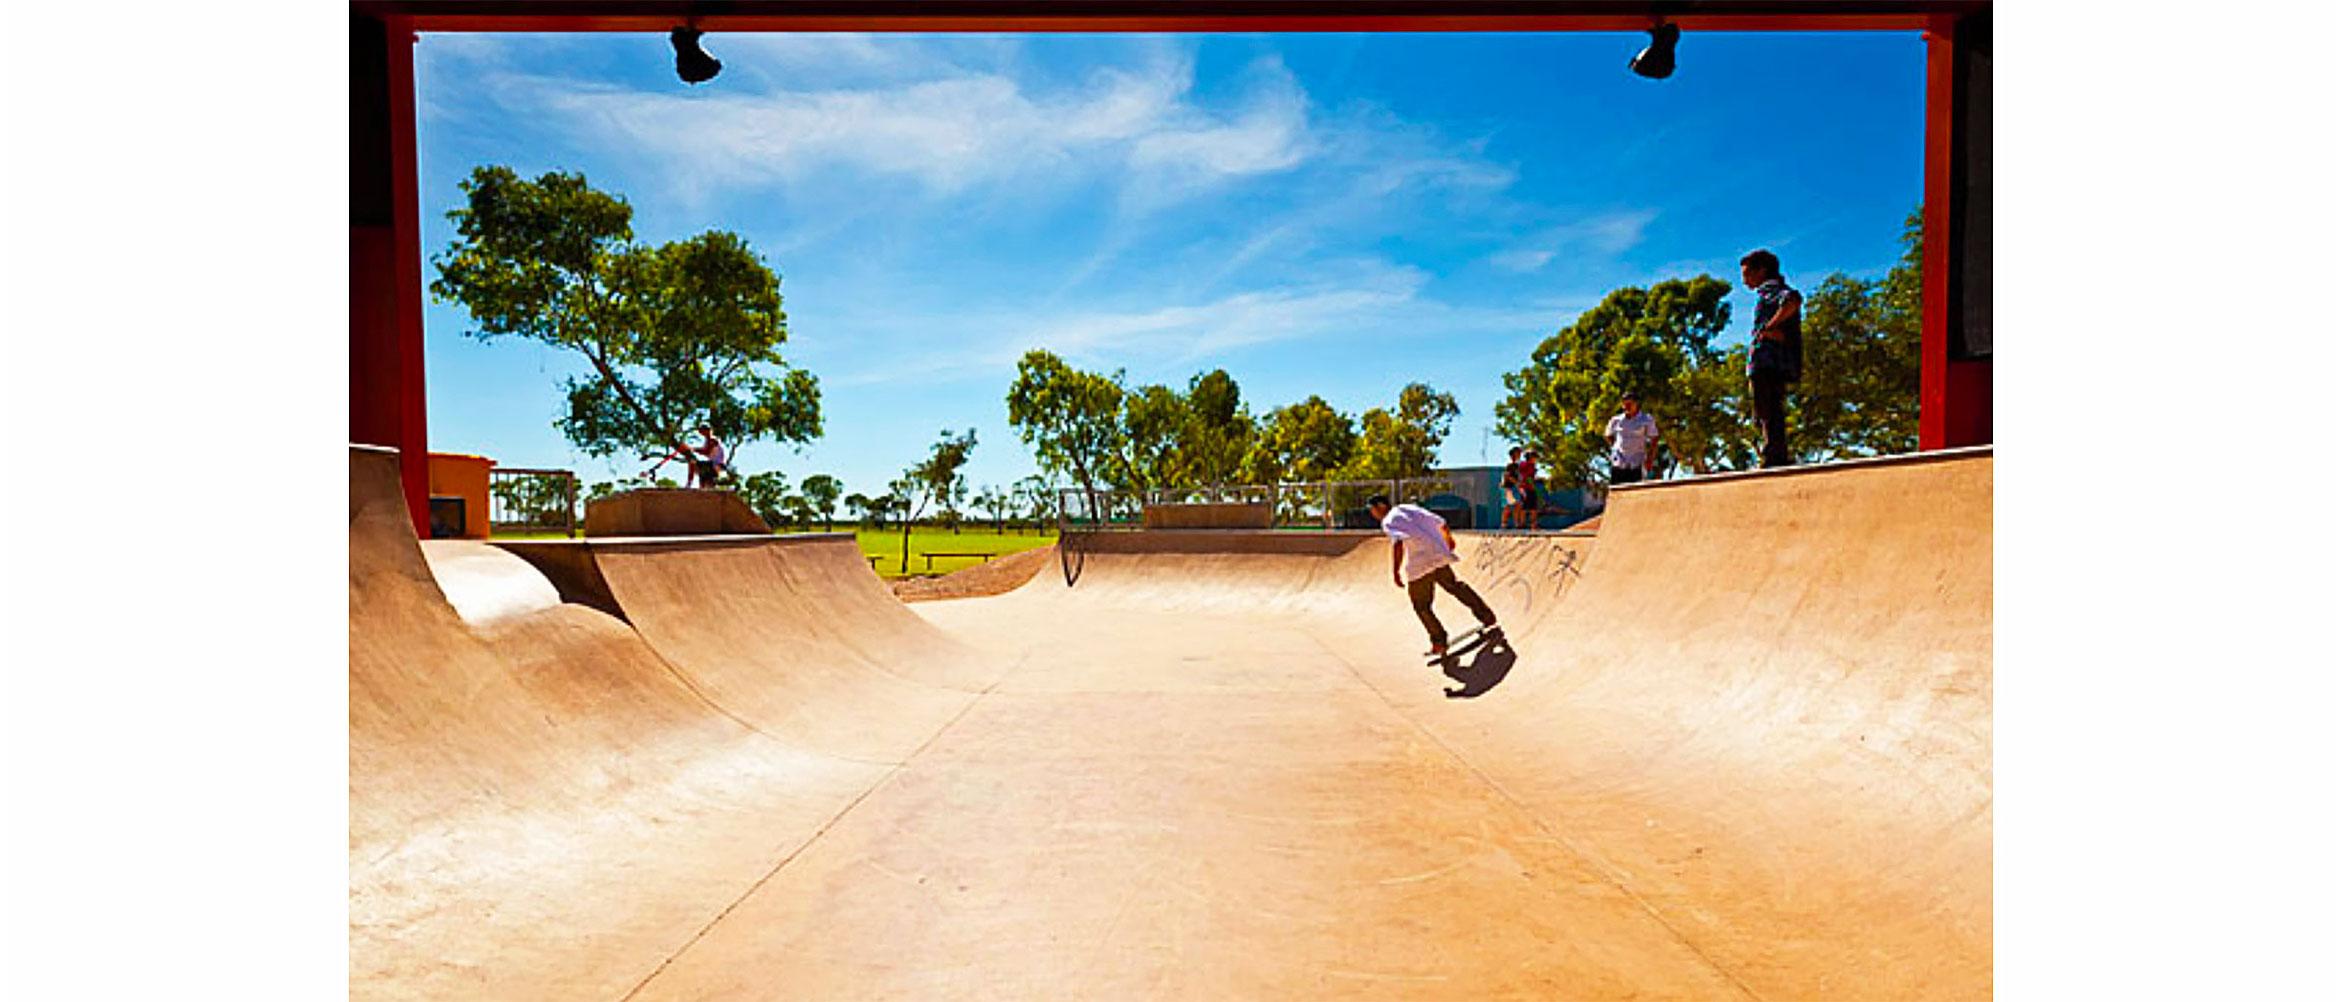 Exmouth mini ramp, skate park Western Australia